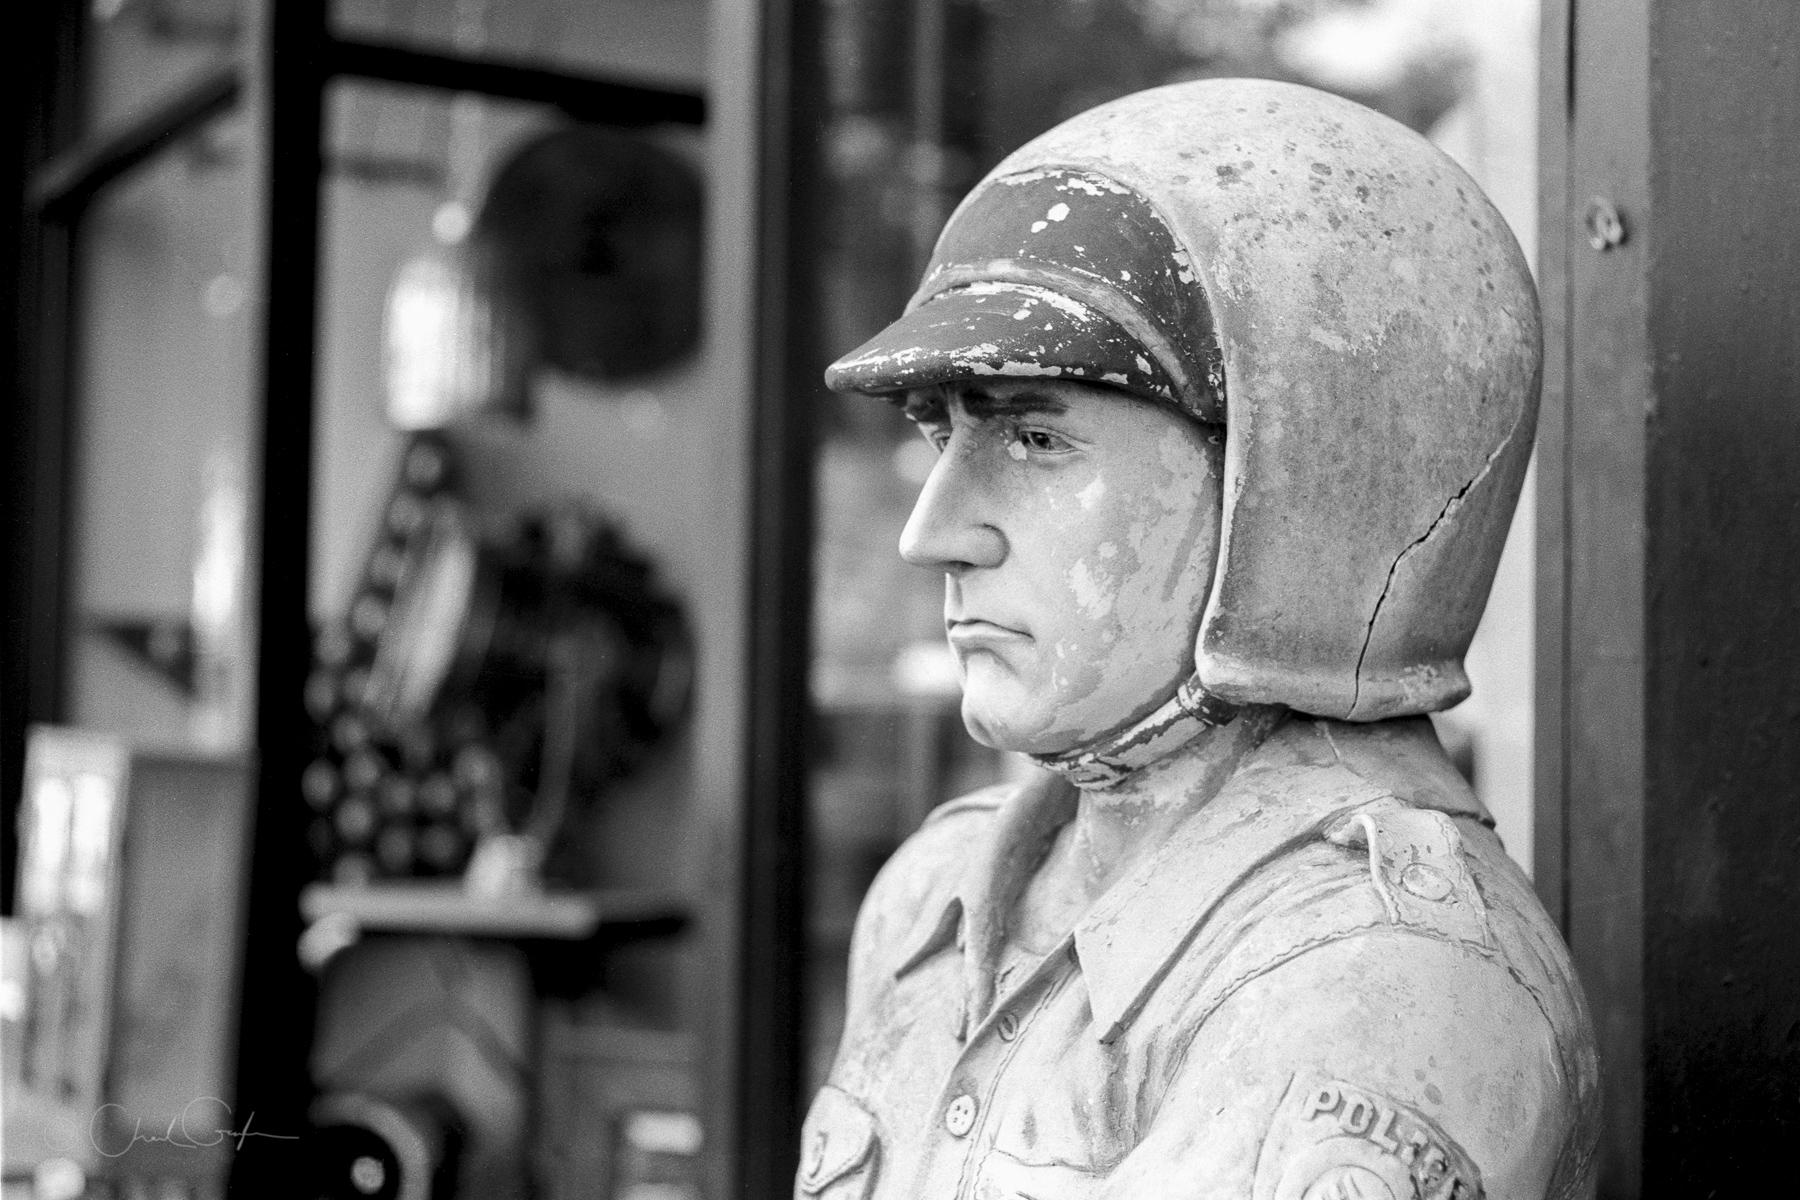 Sad Policeman Statue by Chad Gayle (Image)